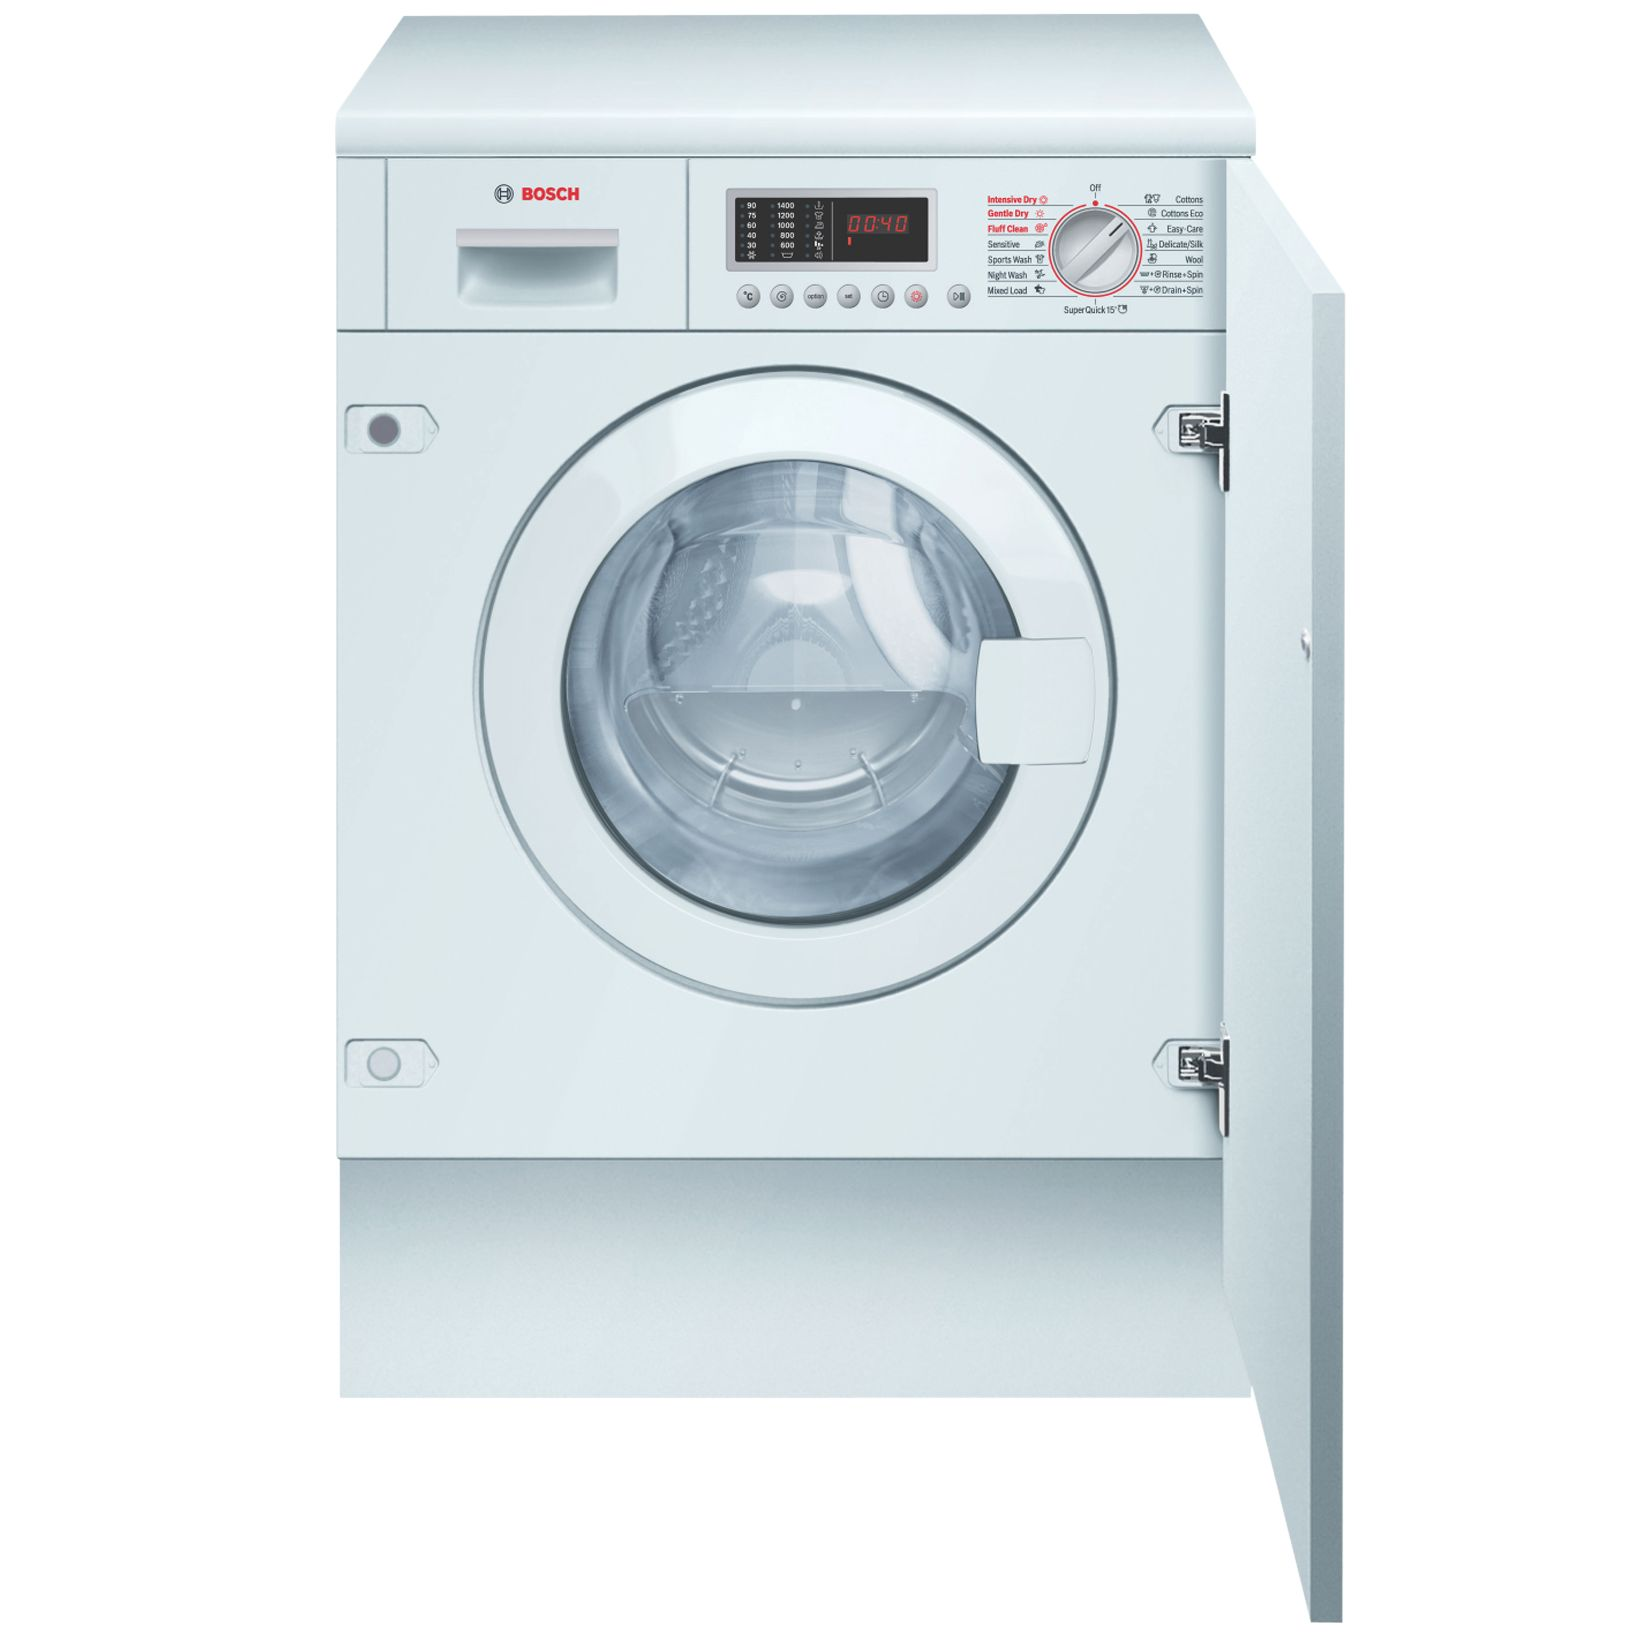 Bosch WKD28540GB Washer Dryer